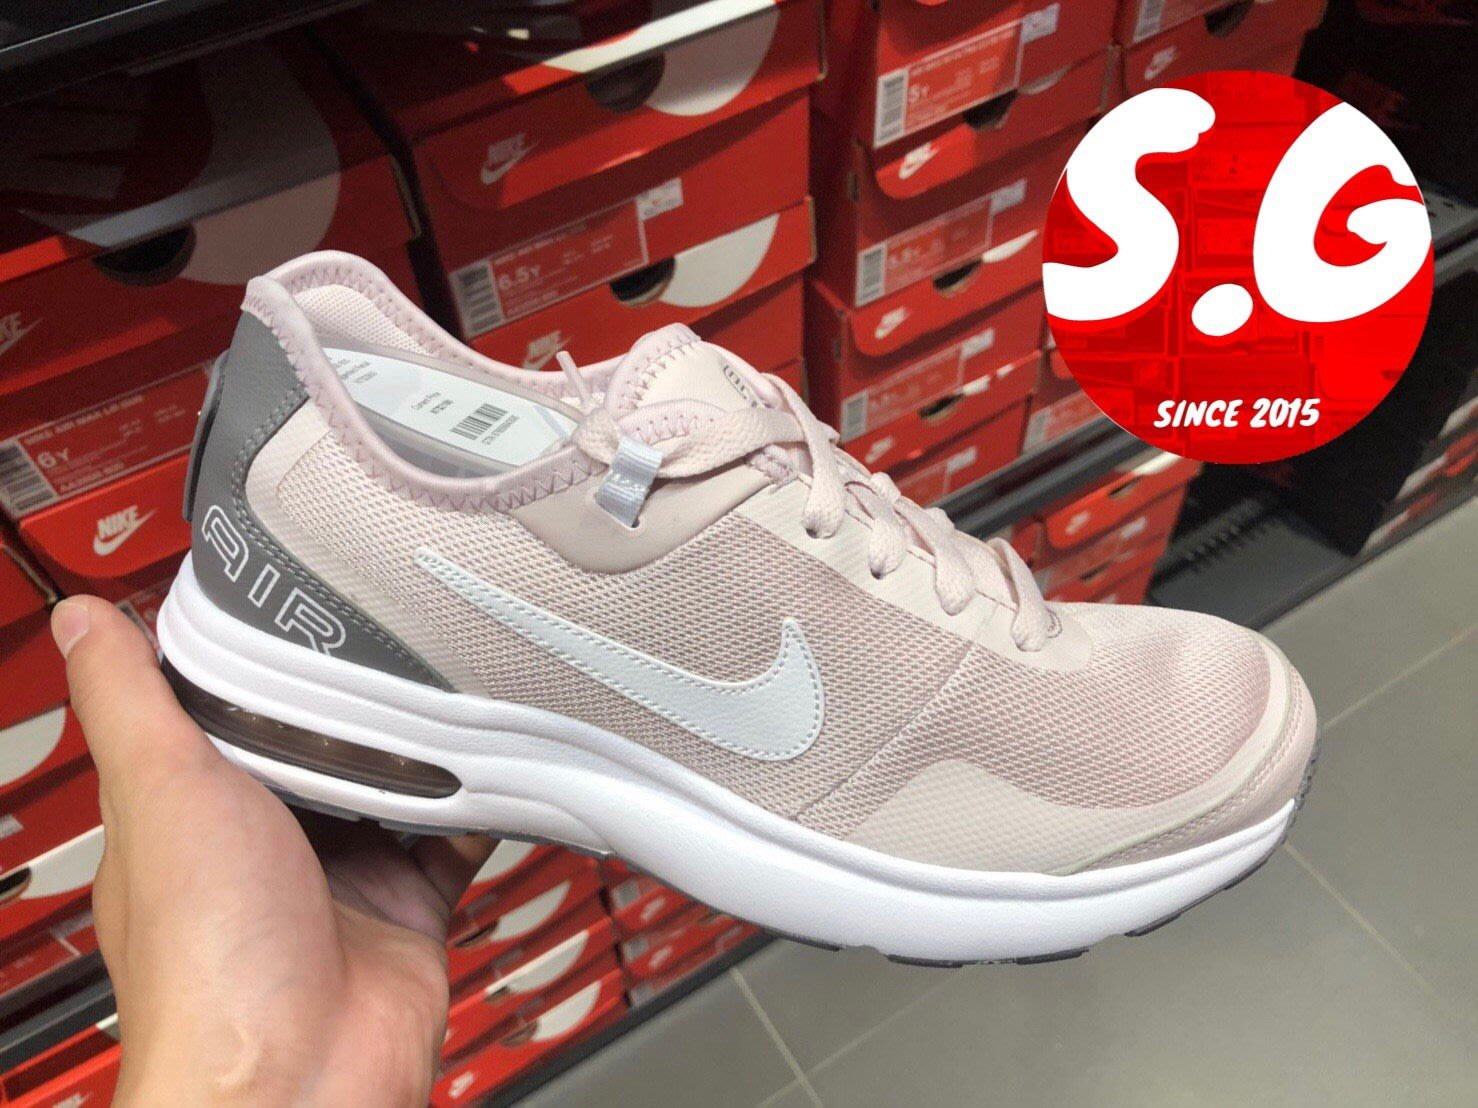 S.G NIKE AIR MAX LB GS 休閒 運動鞋 粉紅 白 AA3508-600